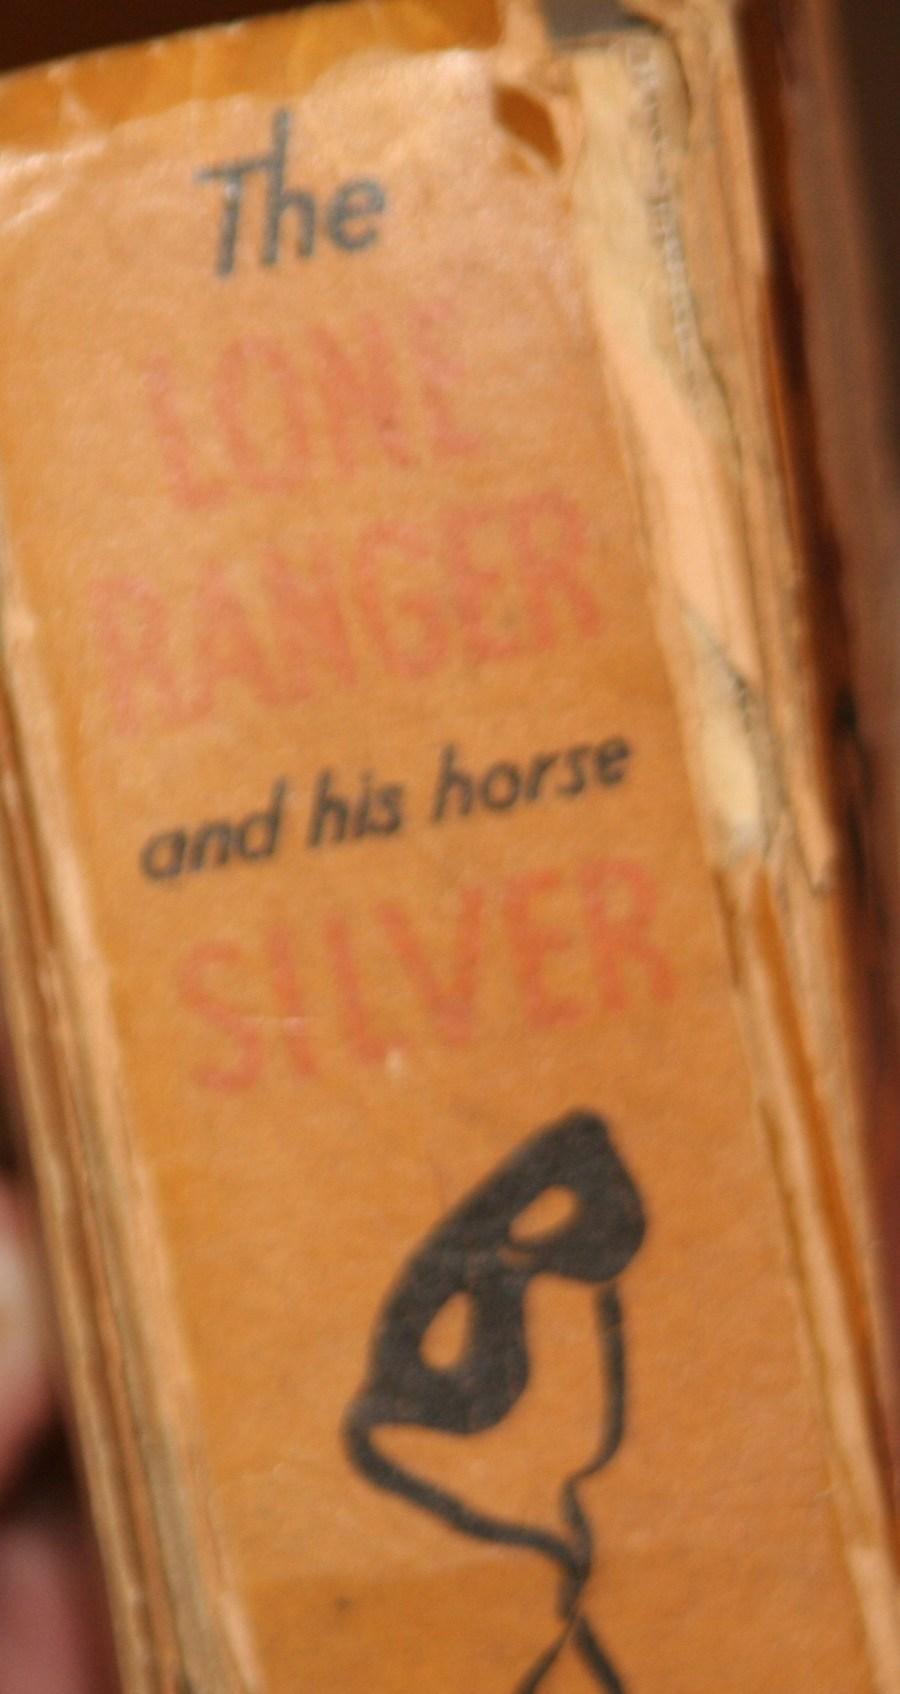 Elvis Jesse Lone Ranger Spine of book